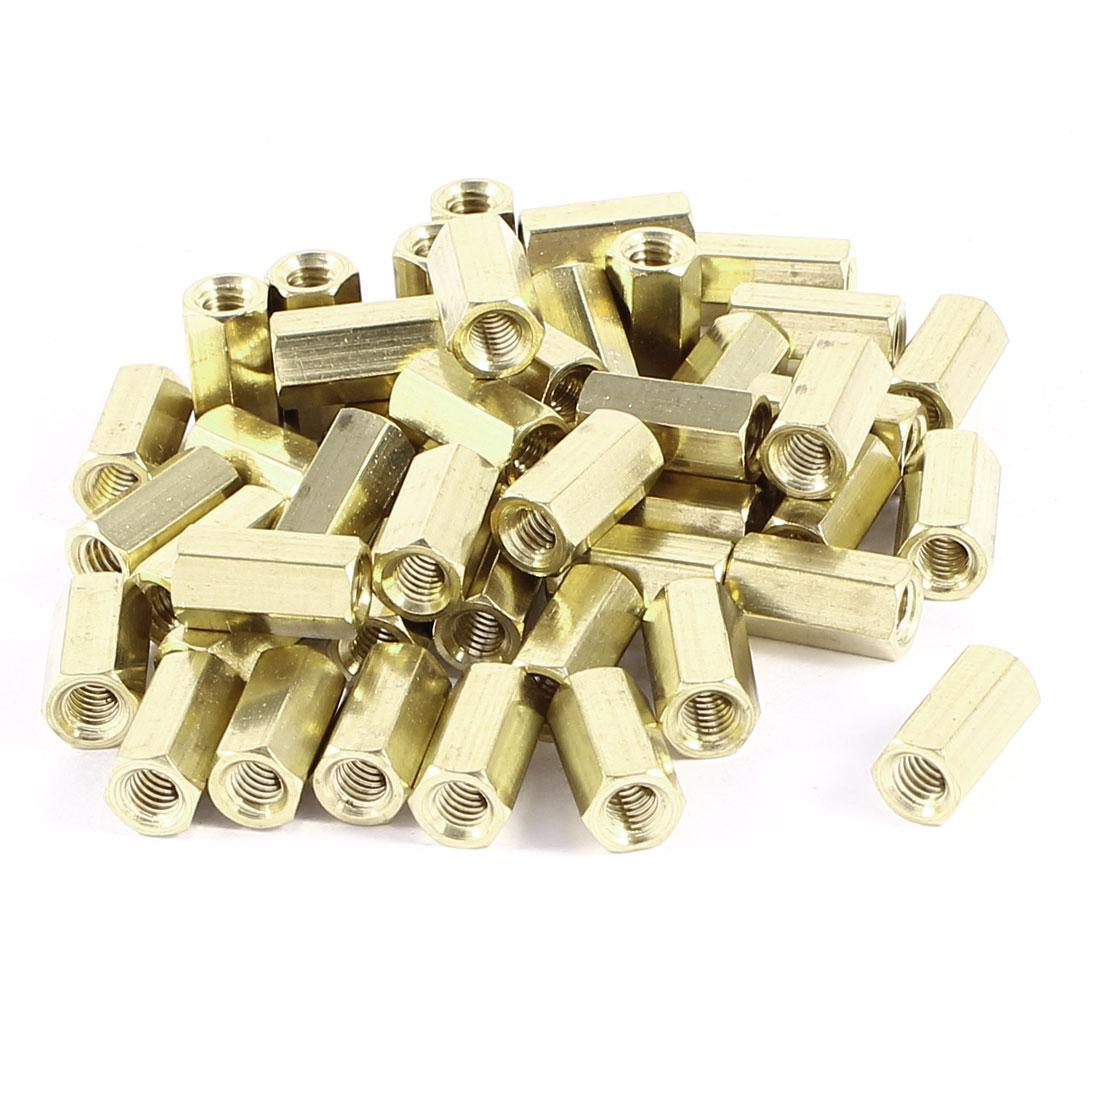 50 Pcs Hex Hexagon Female Nut Brass Standoff Spacer M4x12 M4 12mm